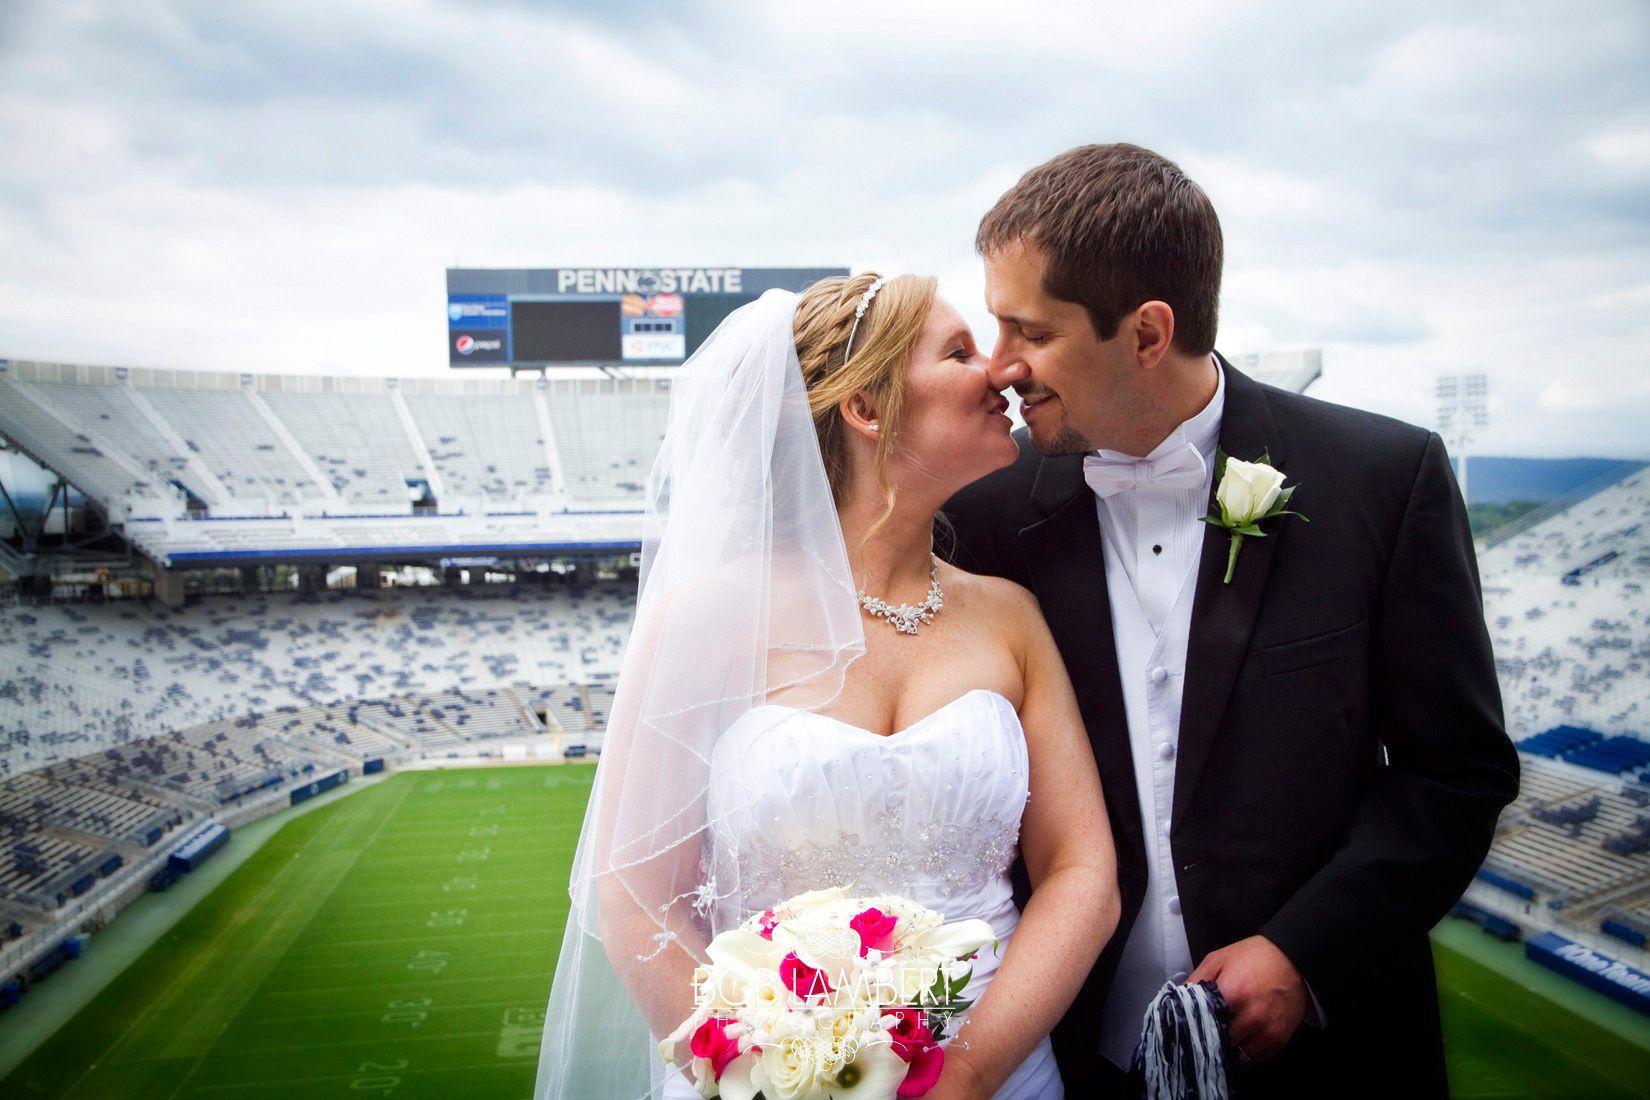 Penn State Wedding Photos Google Search